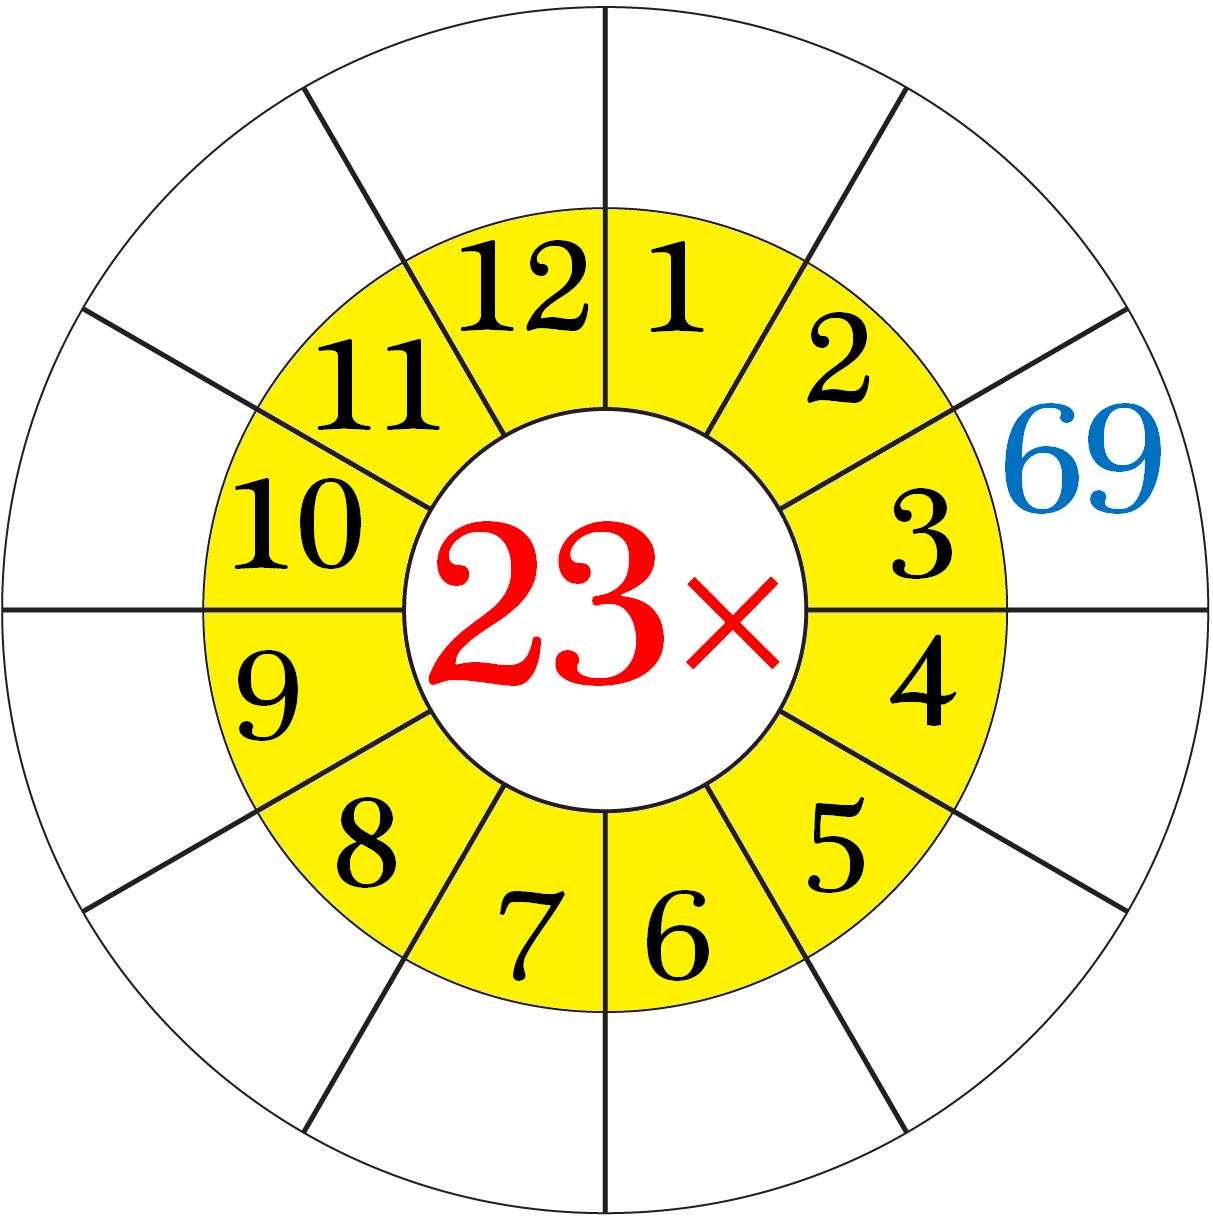 Worksheet on Multiplication Table of 23